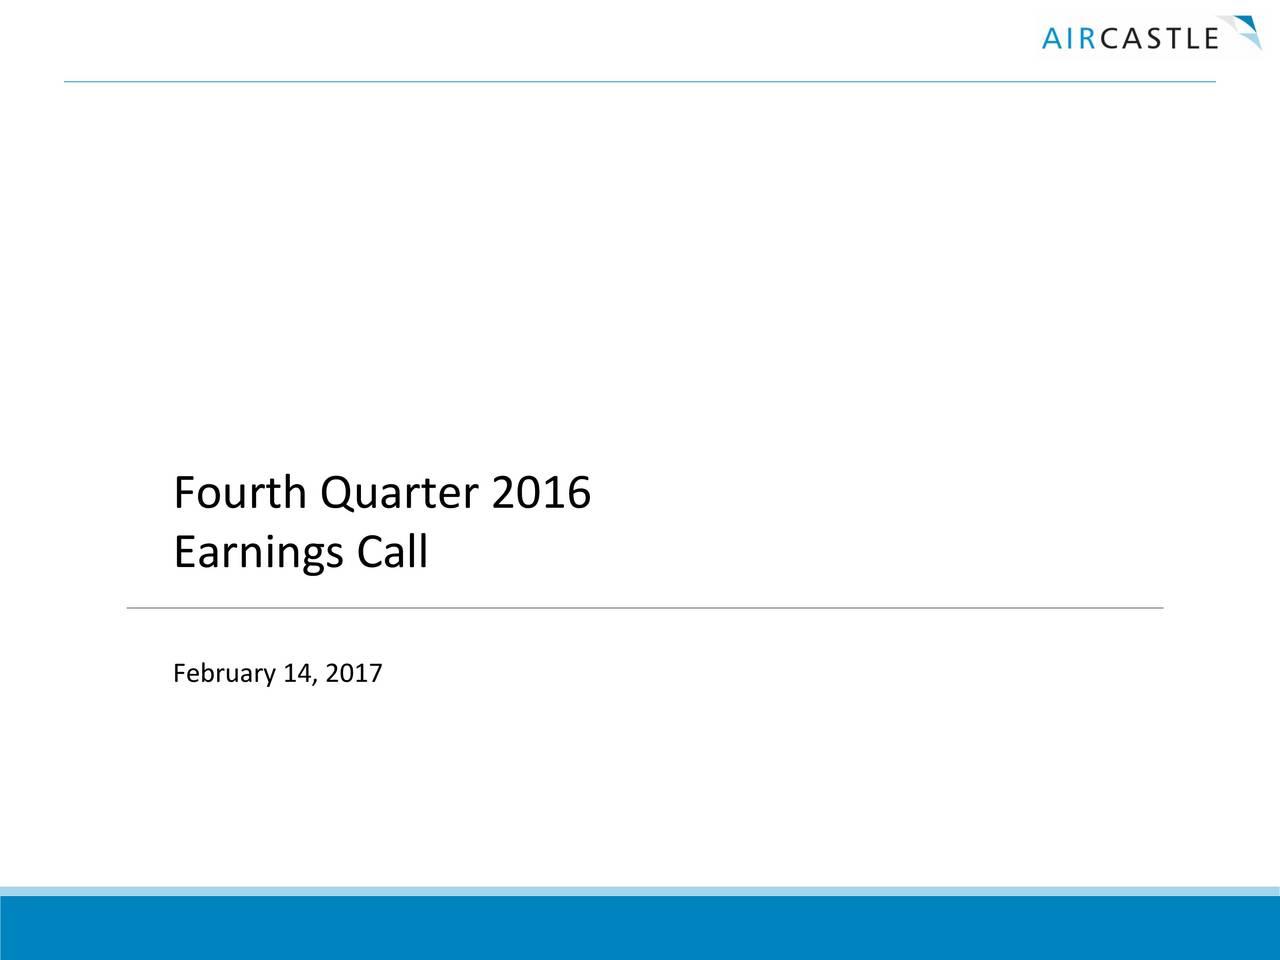 Earnings Call February 14, 2017